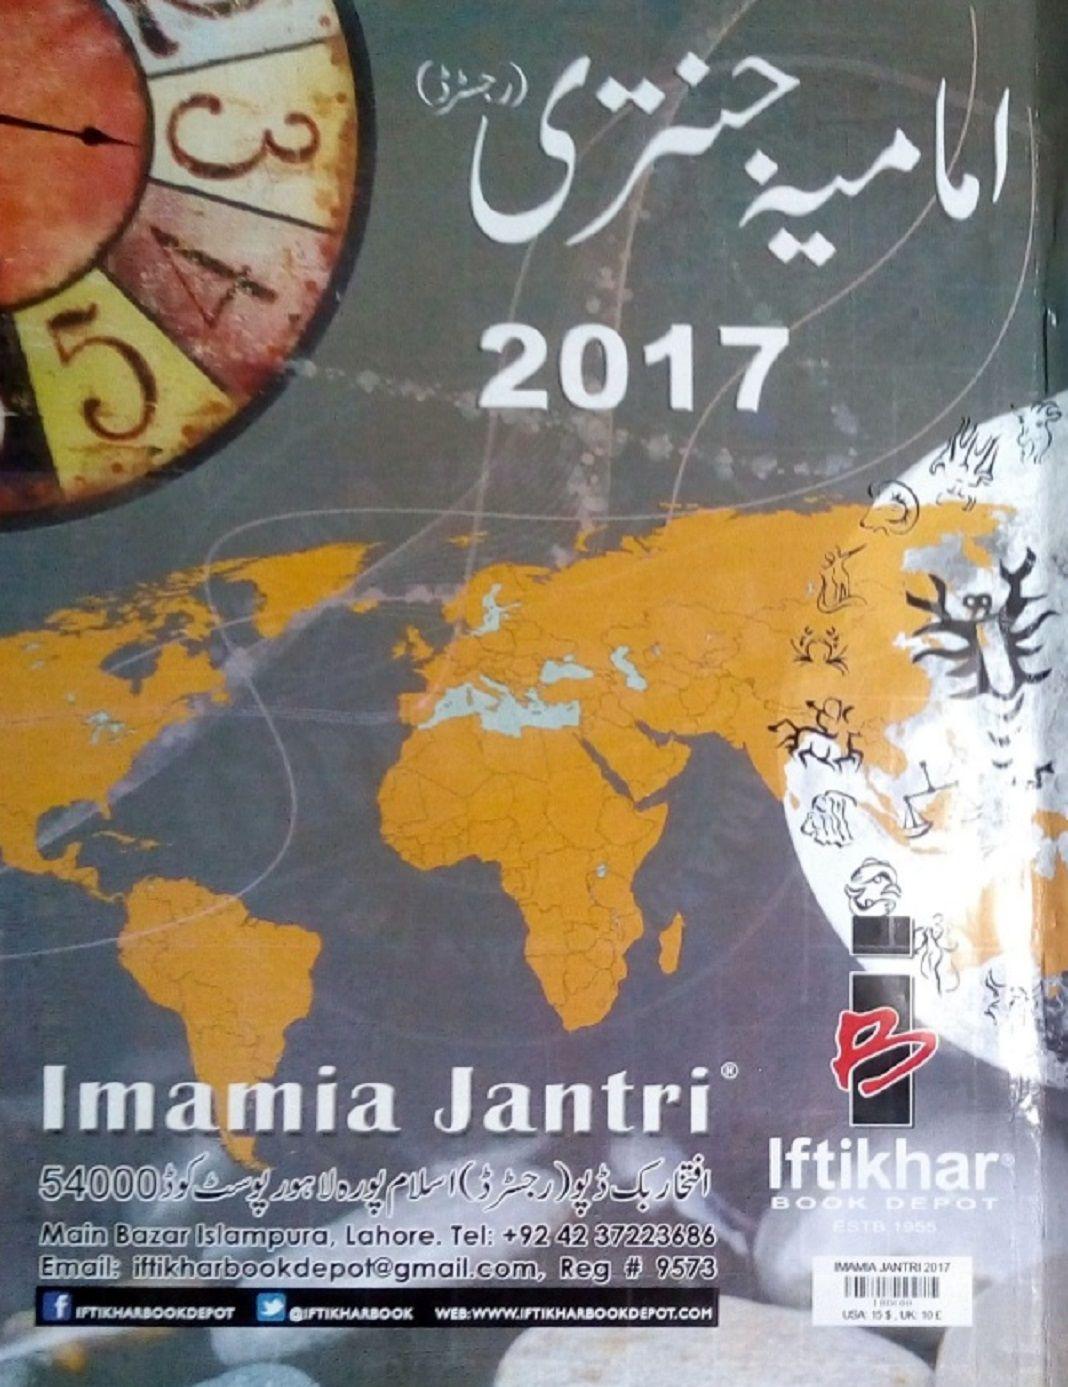 Imamia jantri 2017 free download read online pdf all in one urdu imamia jantri 2017 free download read online pdf all in one urdu books aiourdubooks gumiabroncs Images